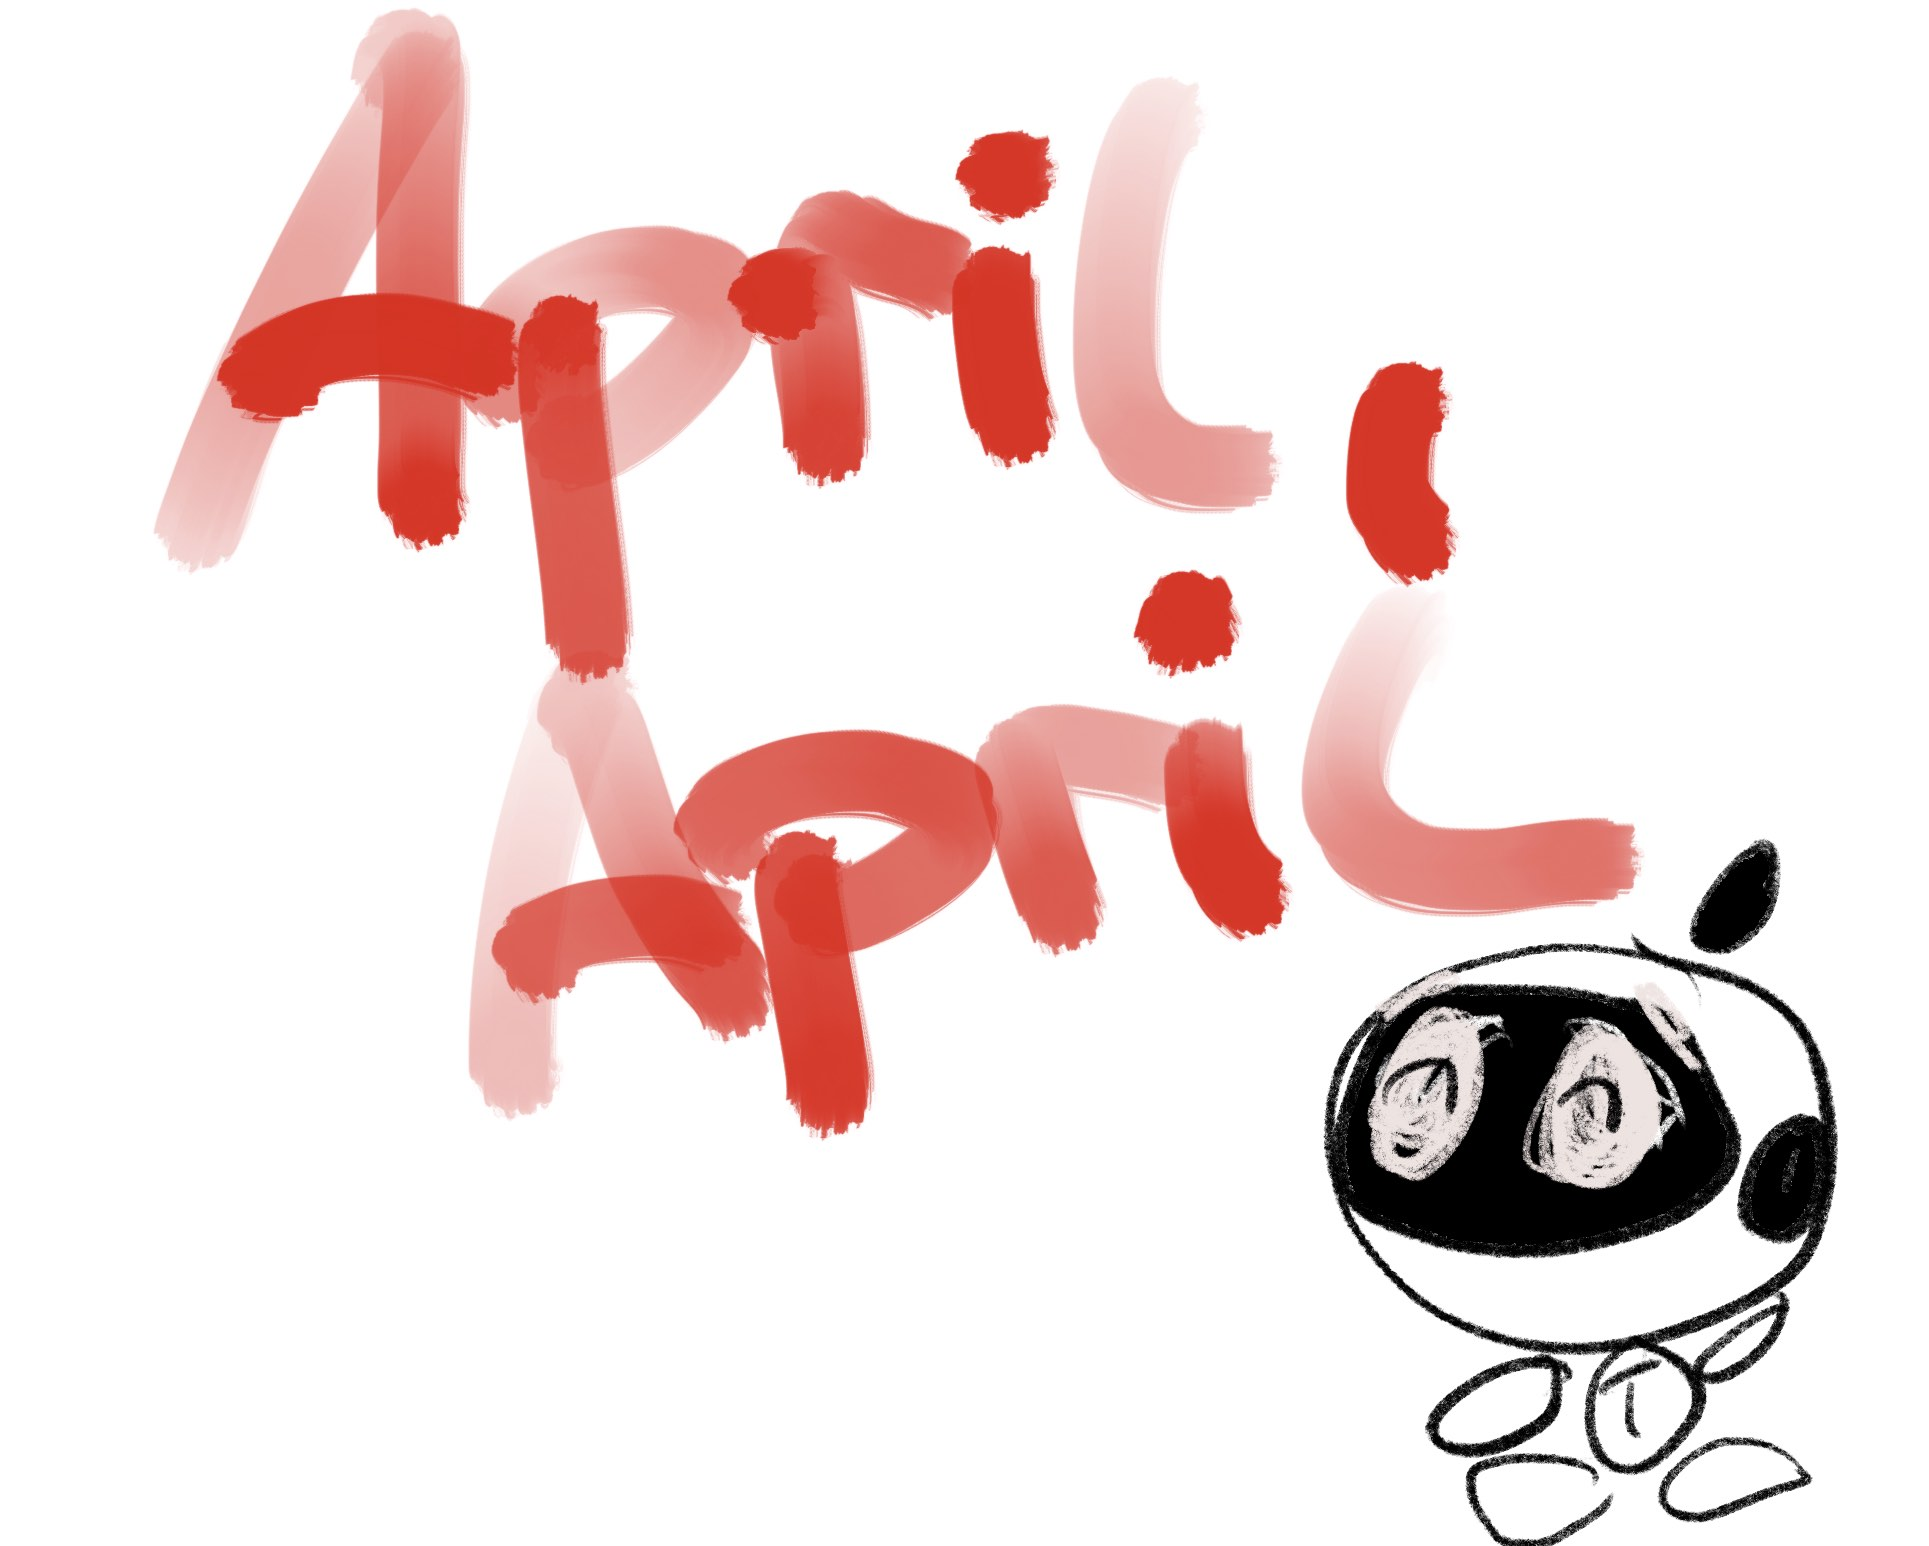 APRIL APRIL!